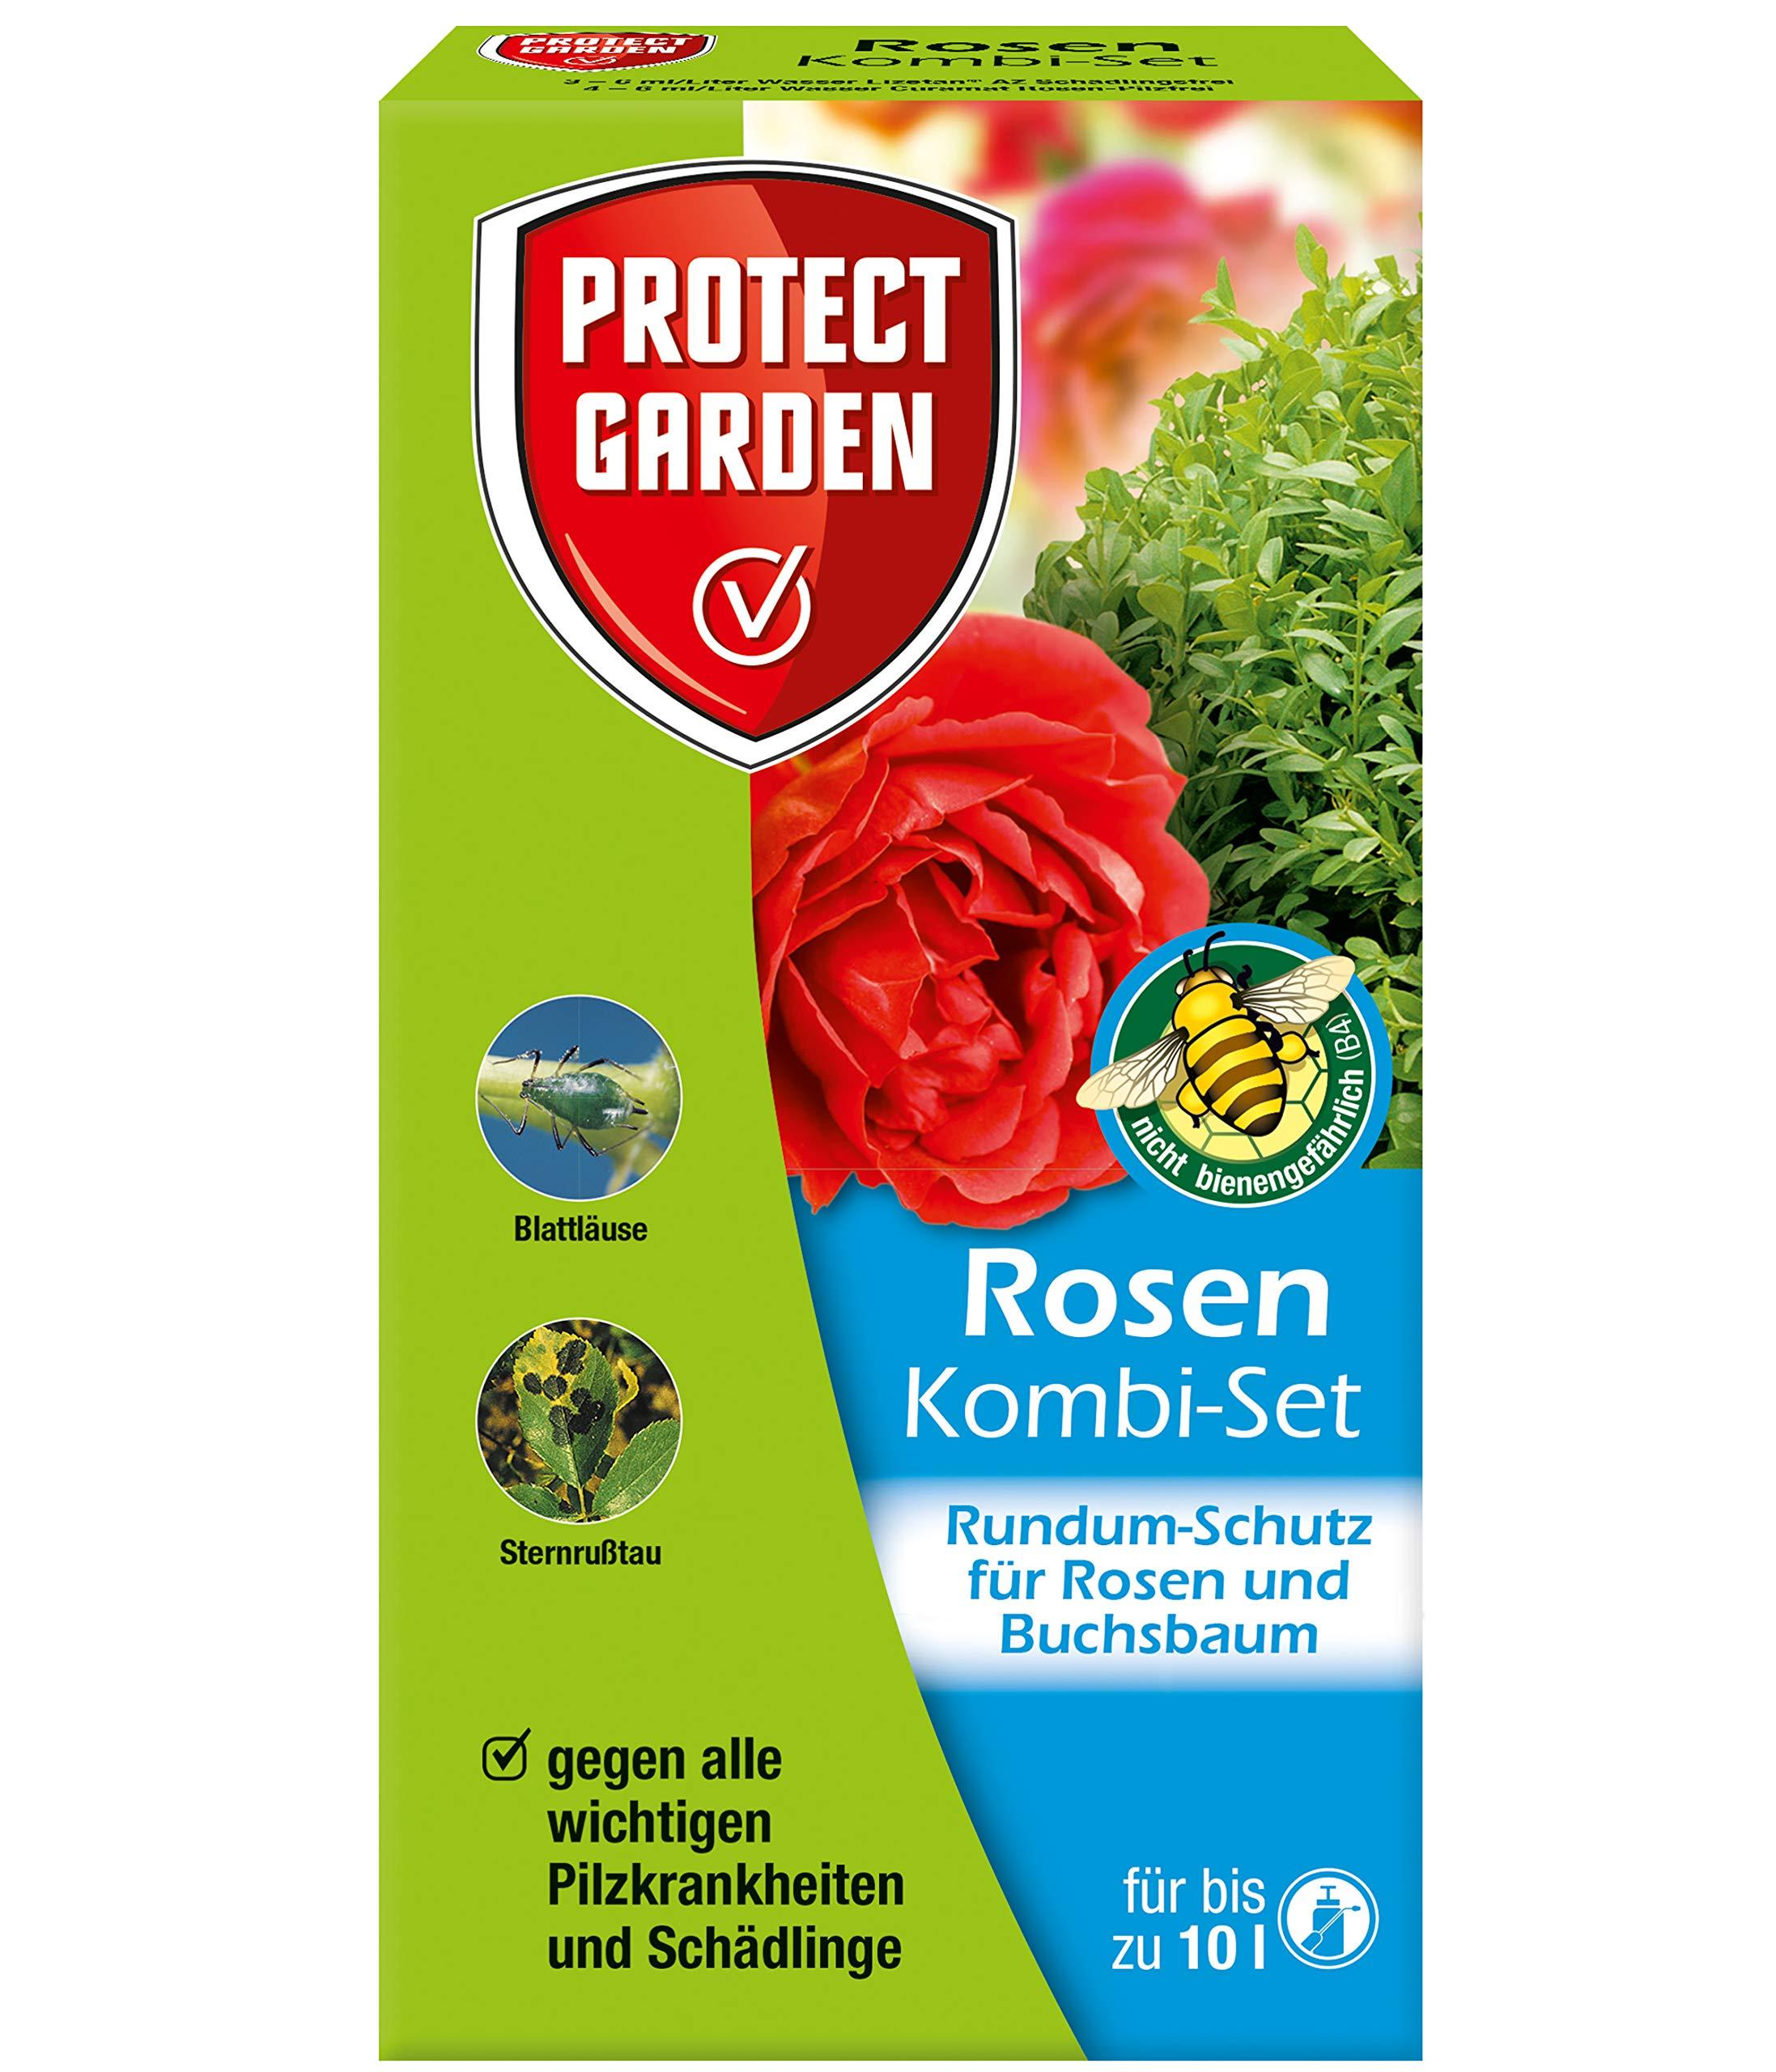 PROTECT GARDEN Rosen Kombi-Set (ehem. Bayer Garten) zur Pilzbekämpfung an Rosen und Zierpflanzen, 130 ml product image